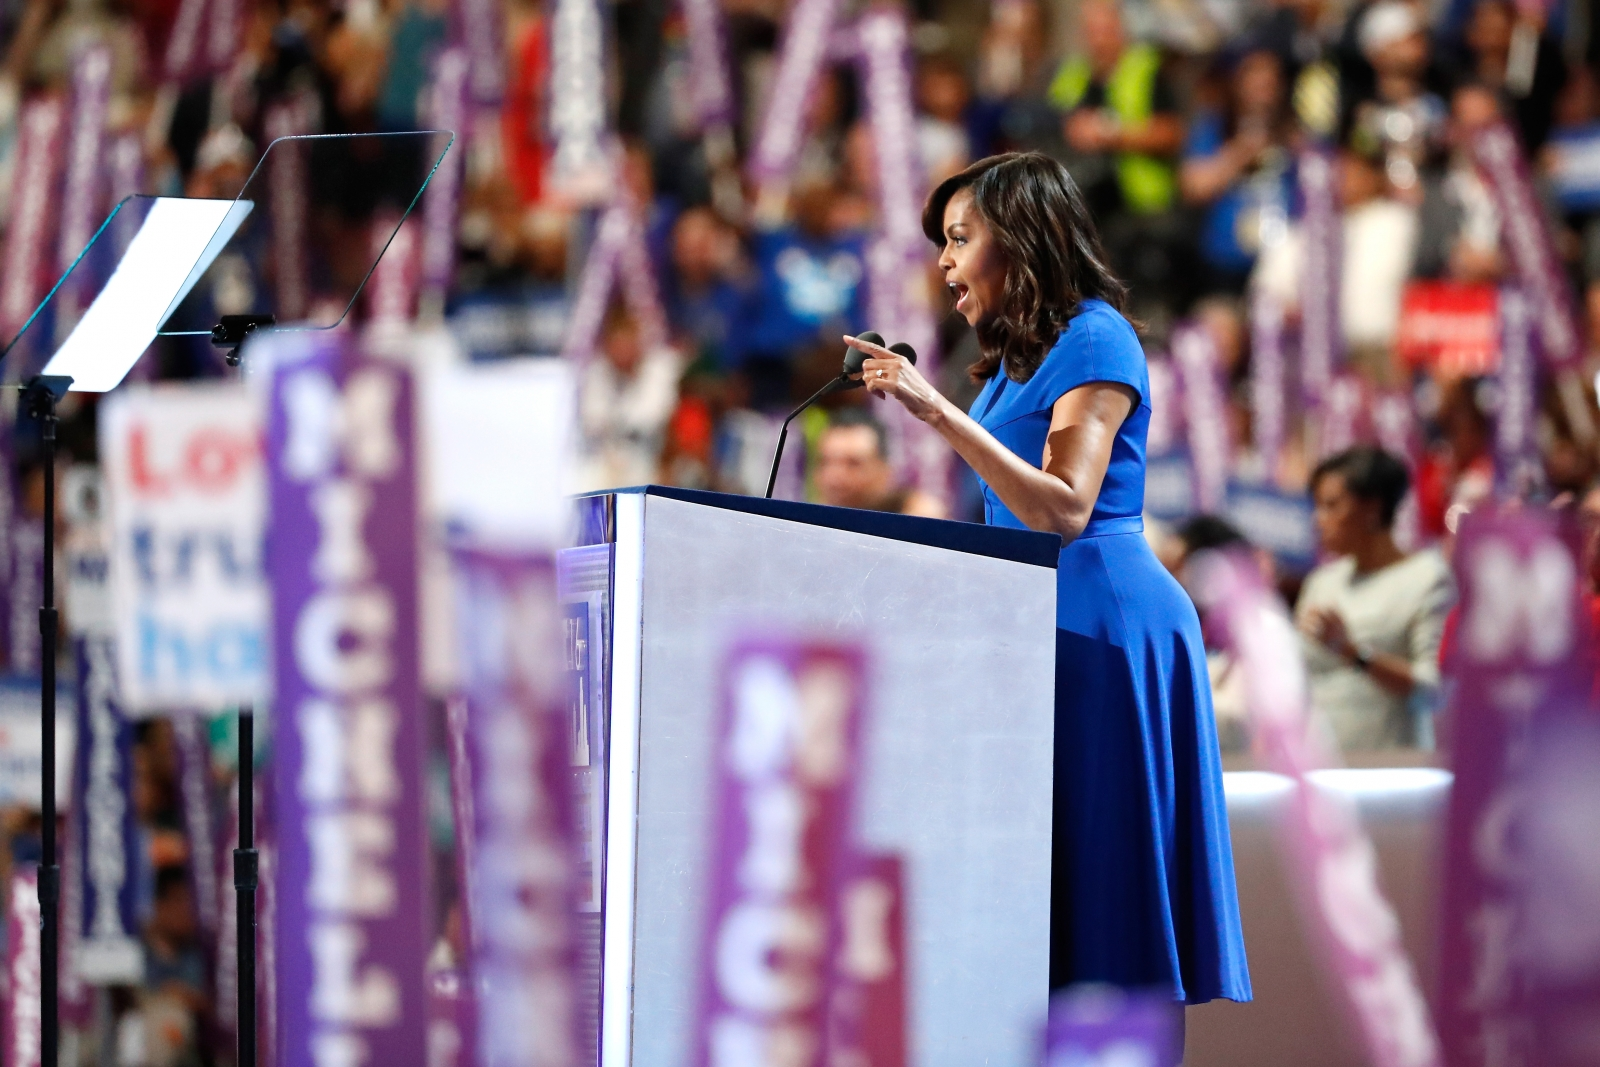 Michelle Obama at DNC